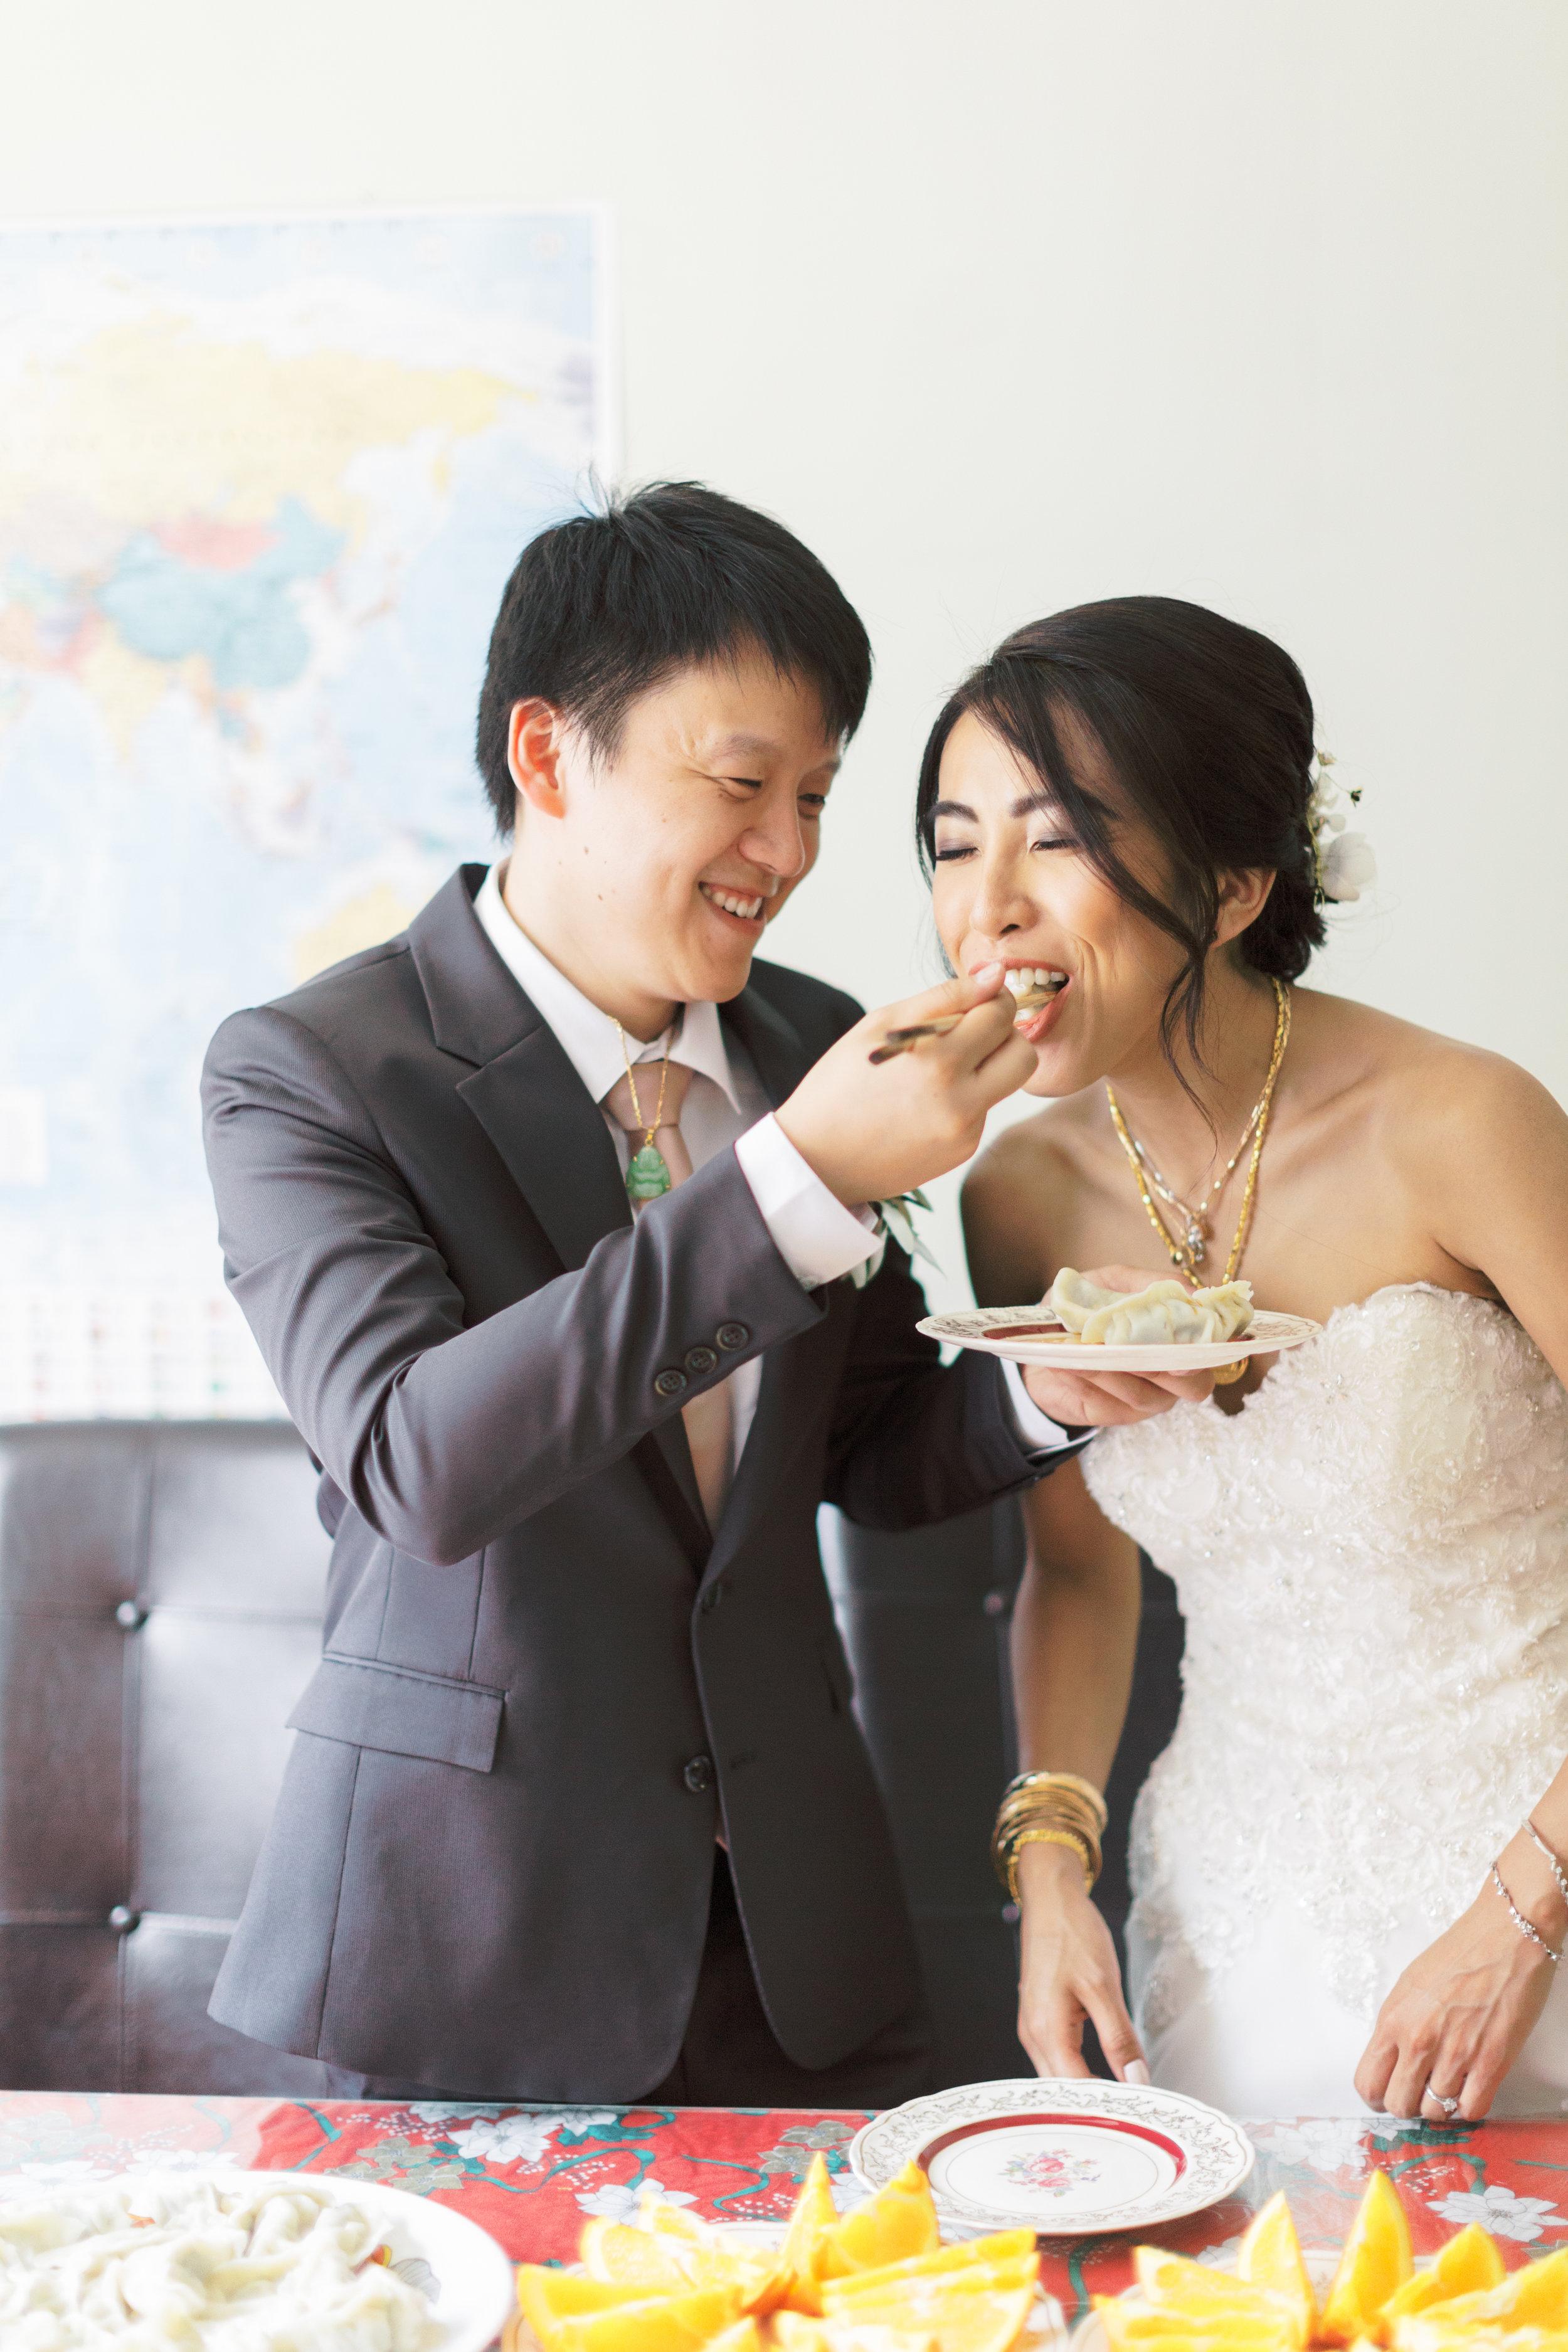 Markham Event Center Wedding-Groom Tea Ceremony-9.jpg